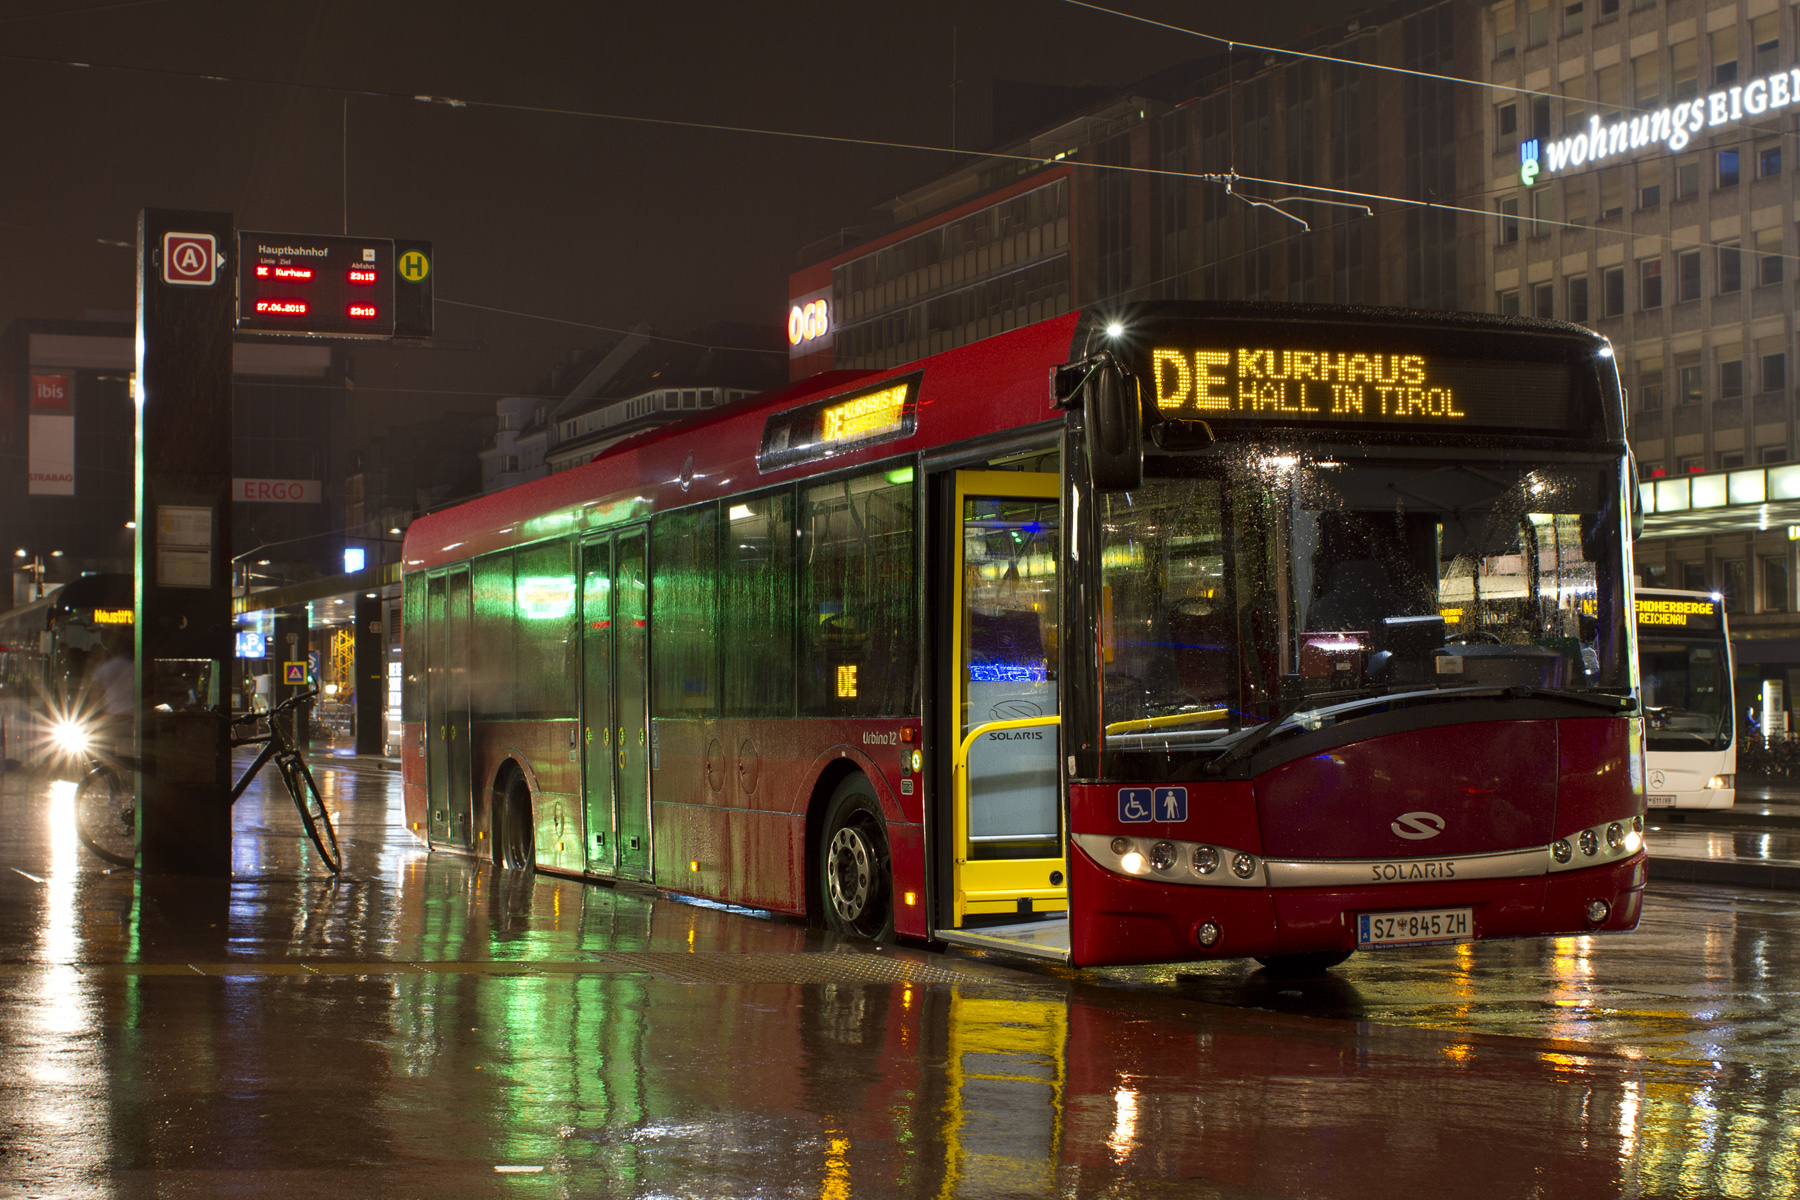 Bus 845 @ Linie DE